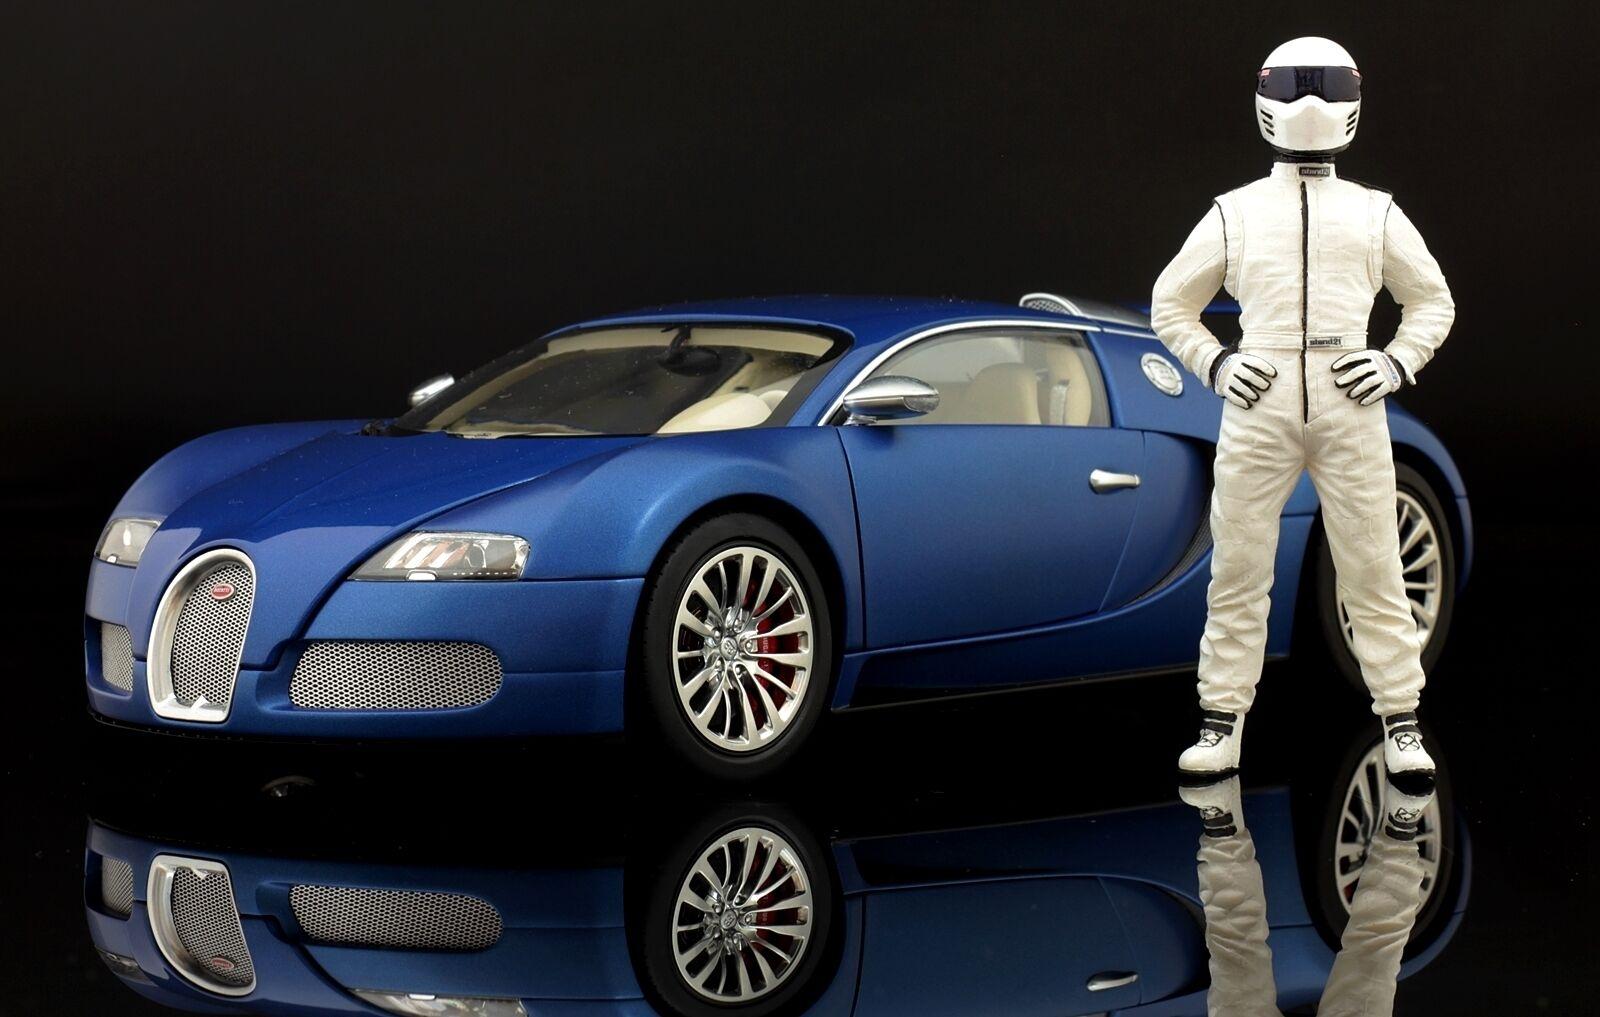 The Weiß STIG Figure for 1 18 Carart Chevrolet Corvette Top Gear  BBR RAR